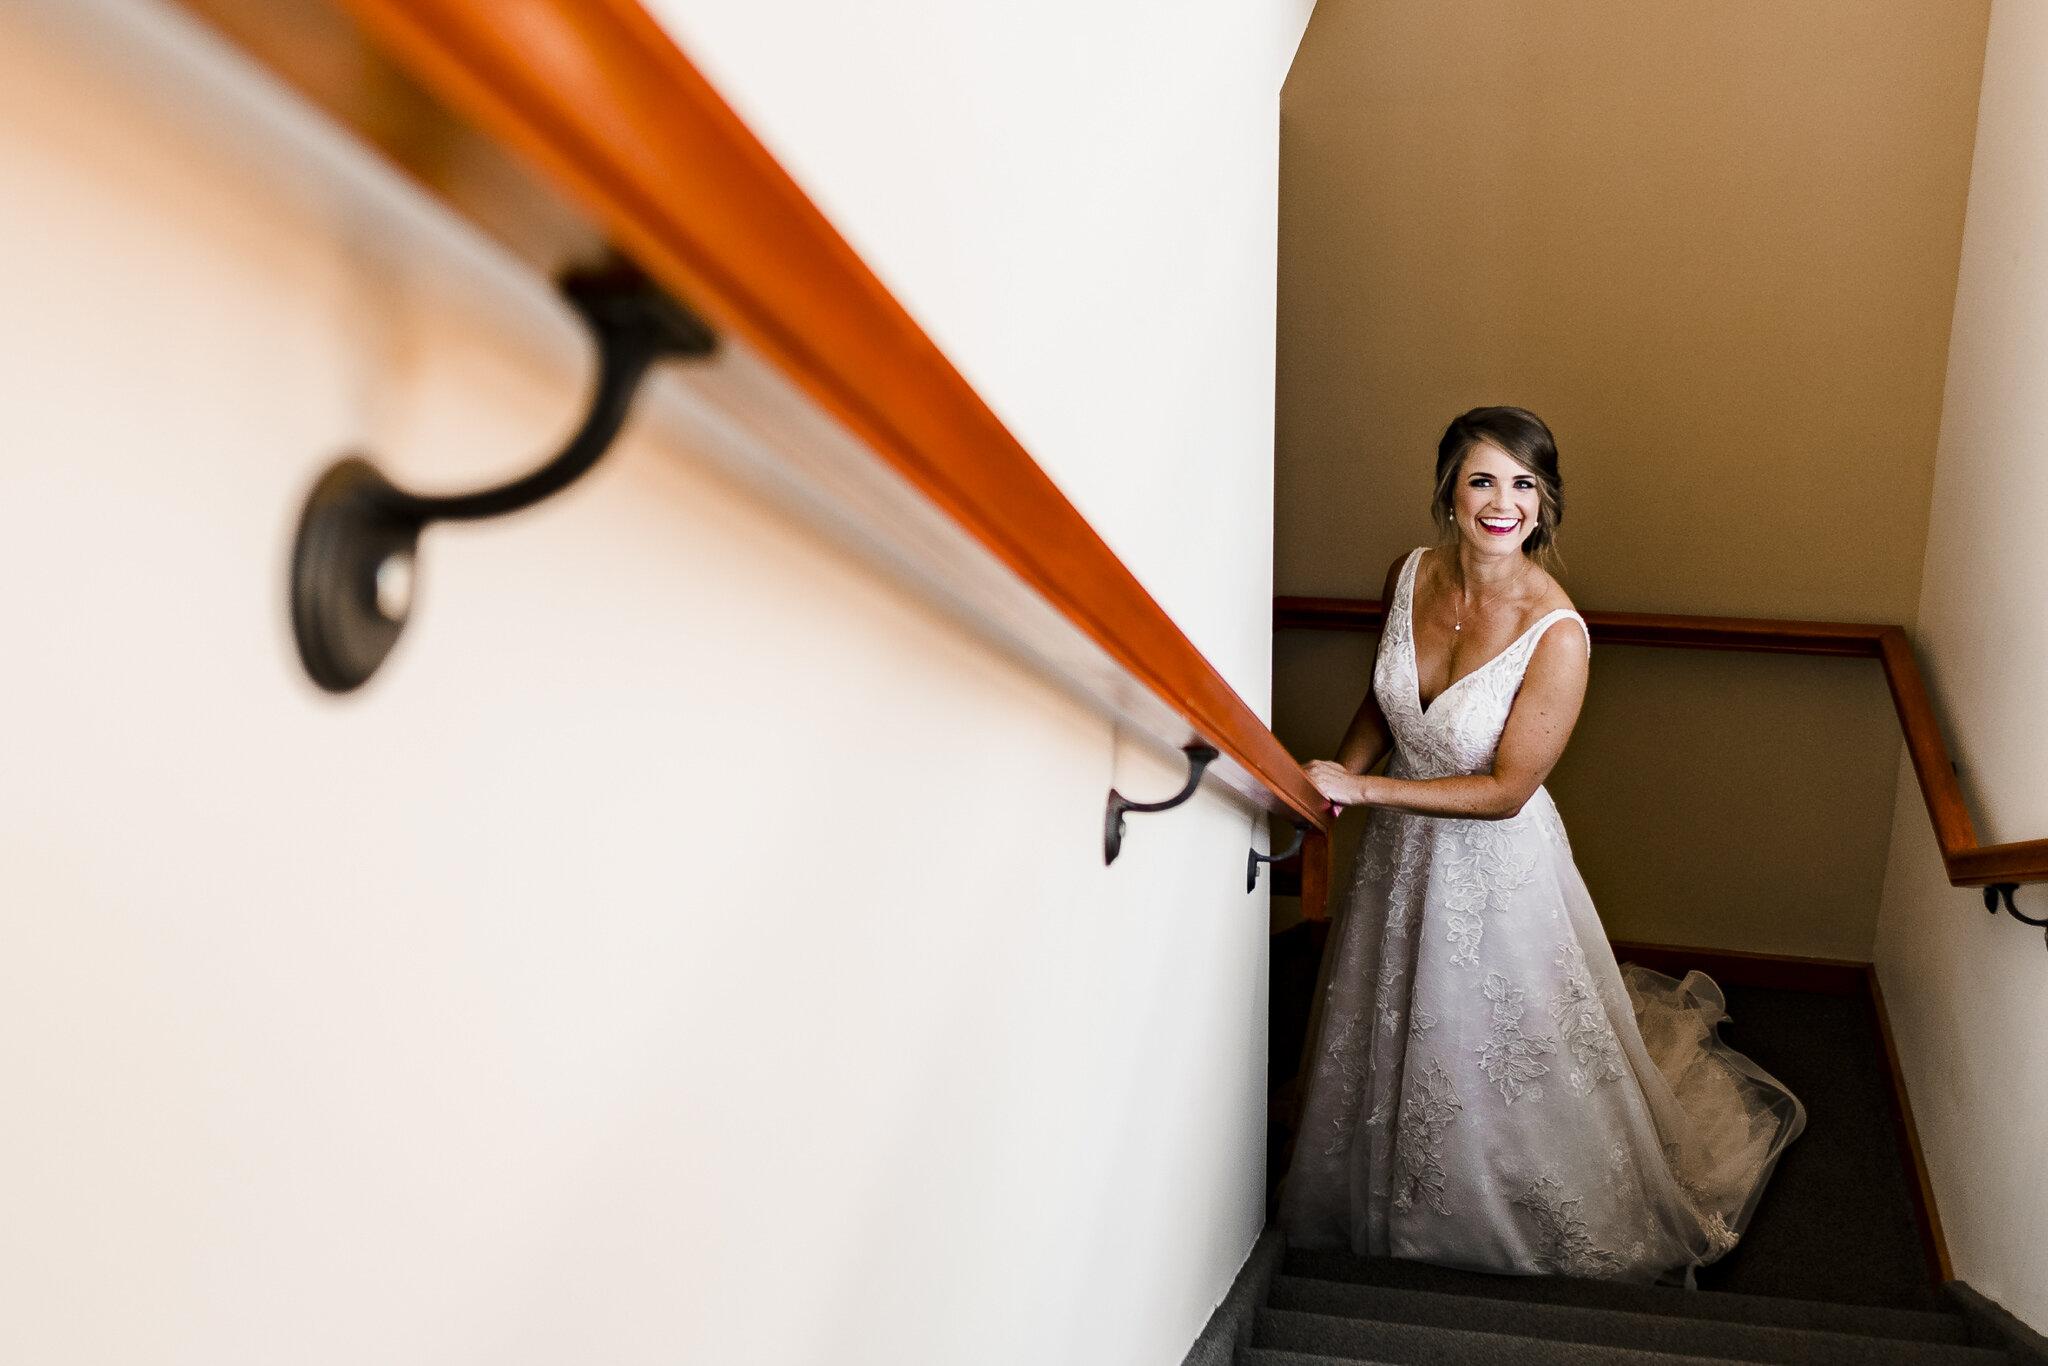 Coyle-Forsgate-Country-Club-Wedding-Photographer-03.JPG